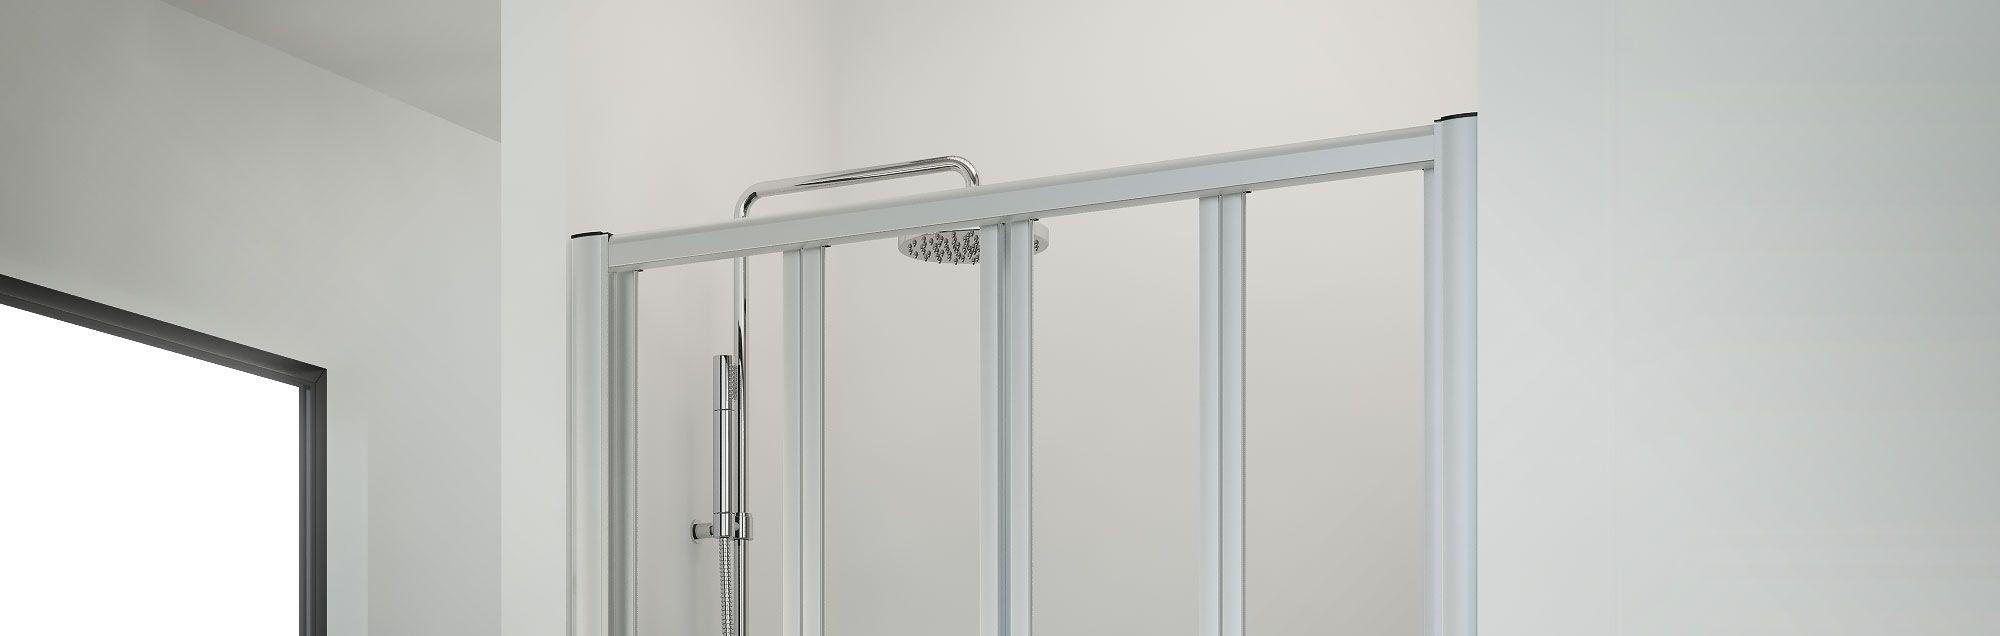 Serie plegadux. box doccia pieghevole per vasca su misura profiltek